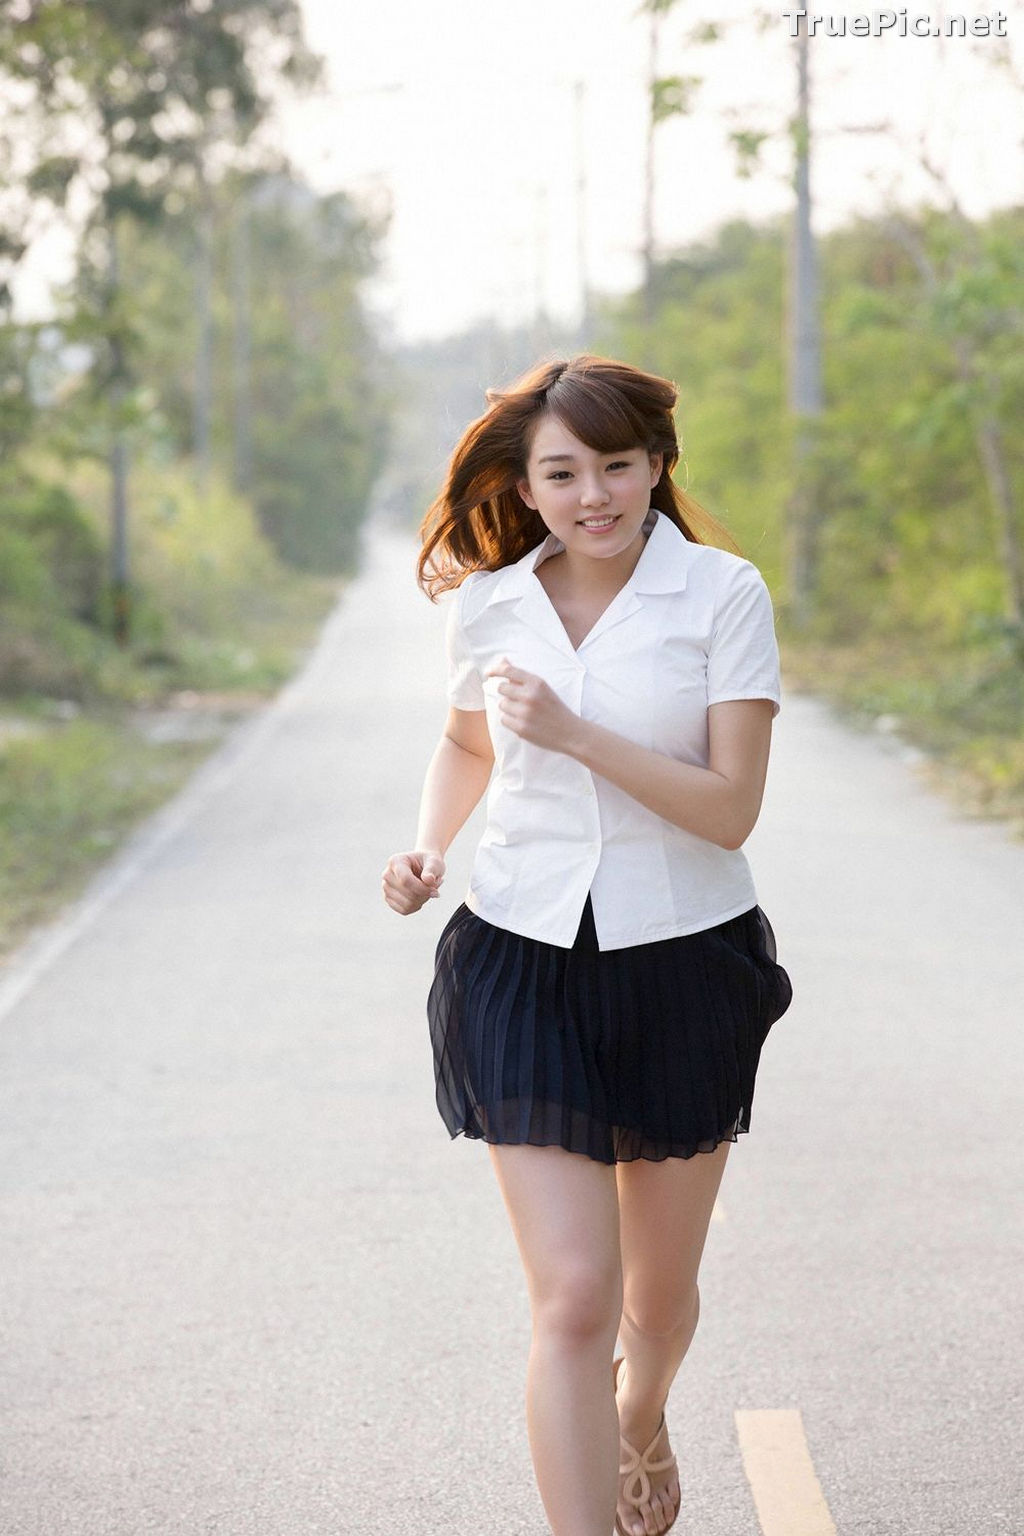 Image [YS Web] Vol.560 - Japanese Gravure Idol and Singer - Ai Shinozaki - TruePic.net - Picture-8